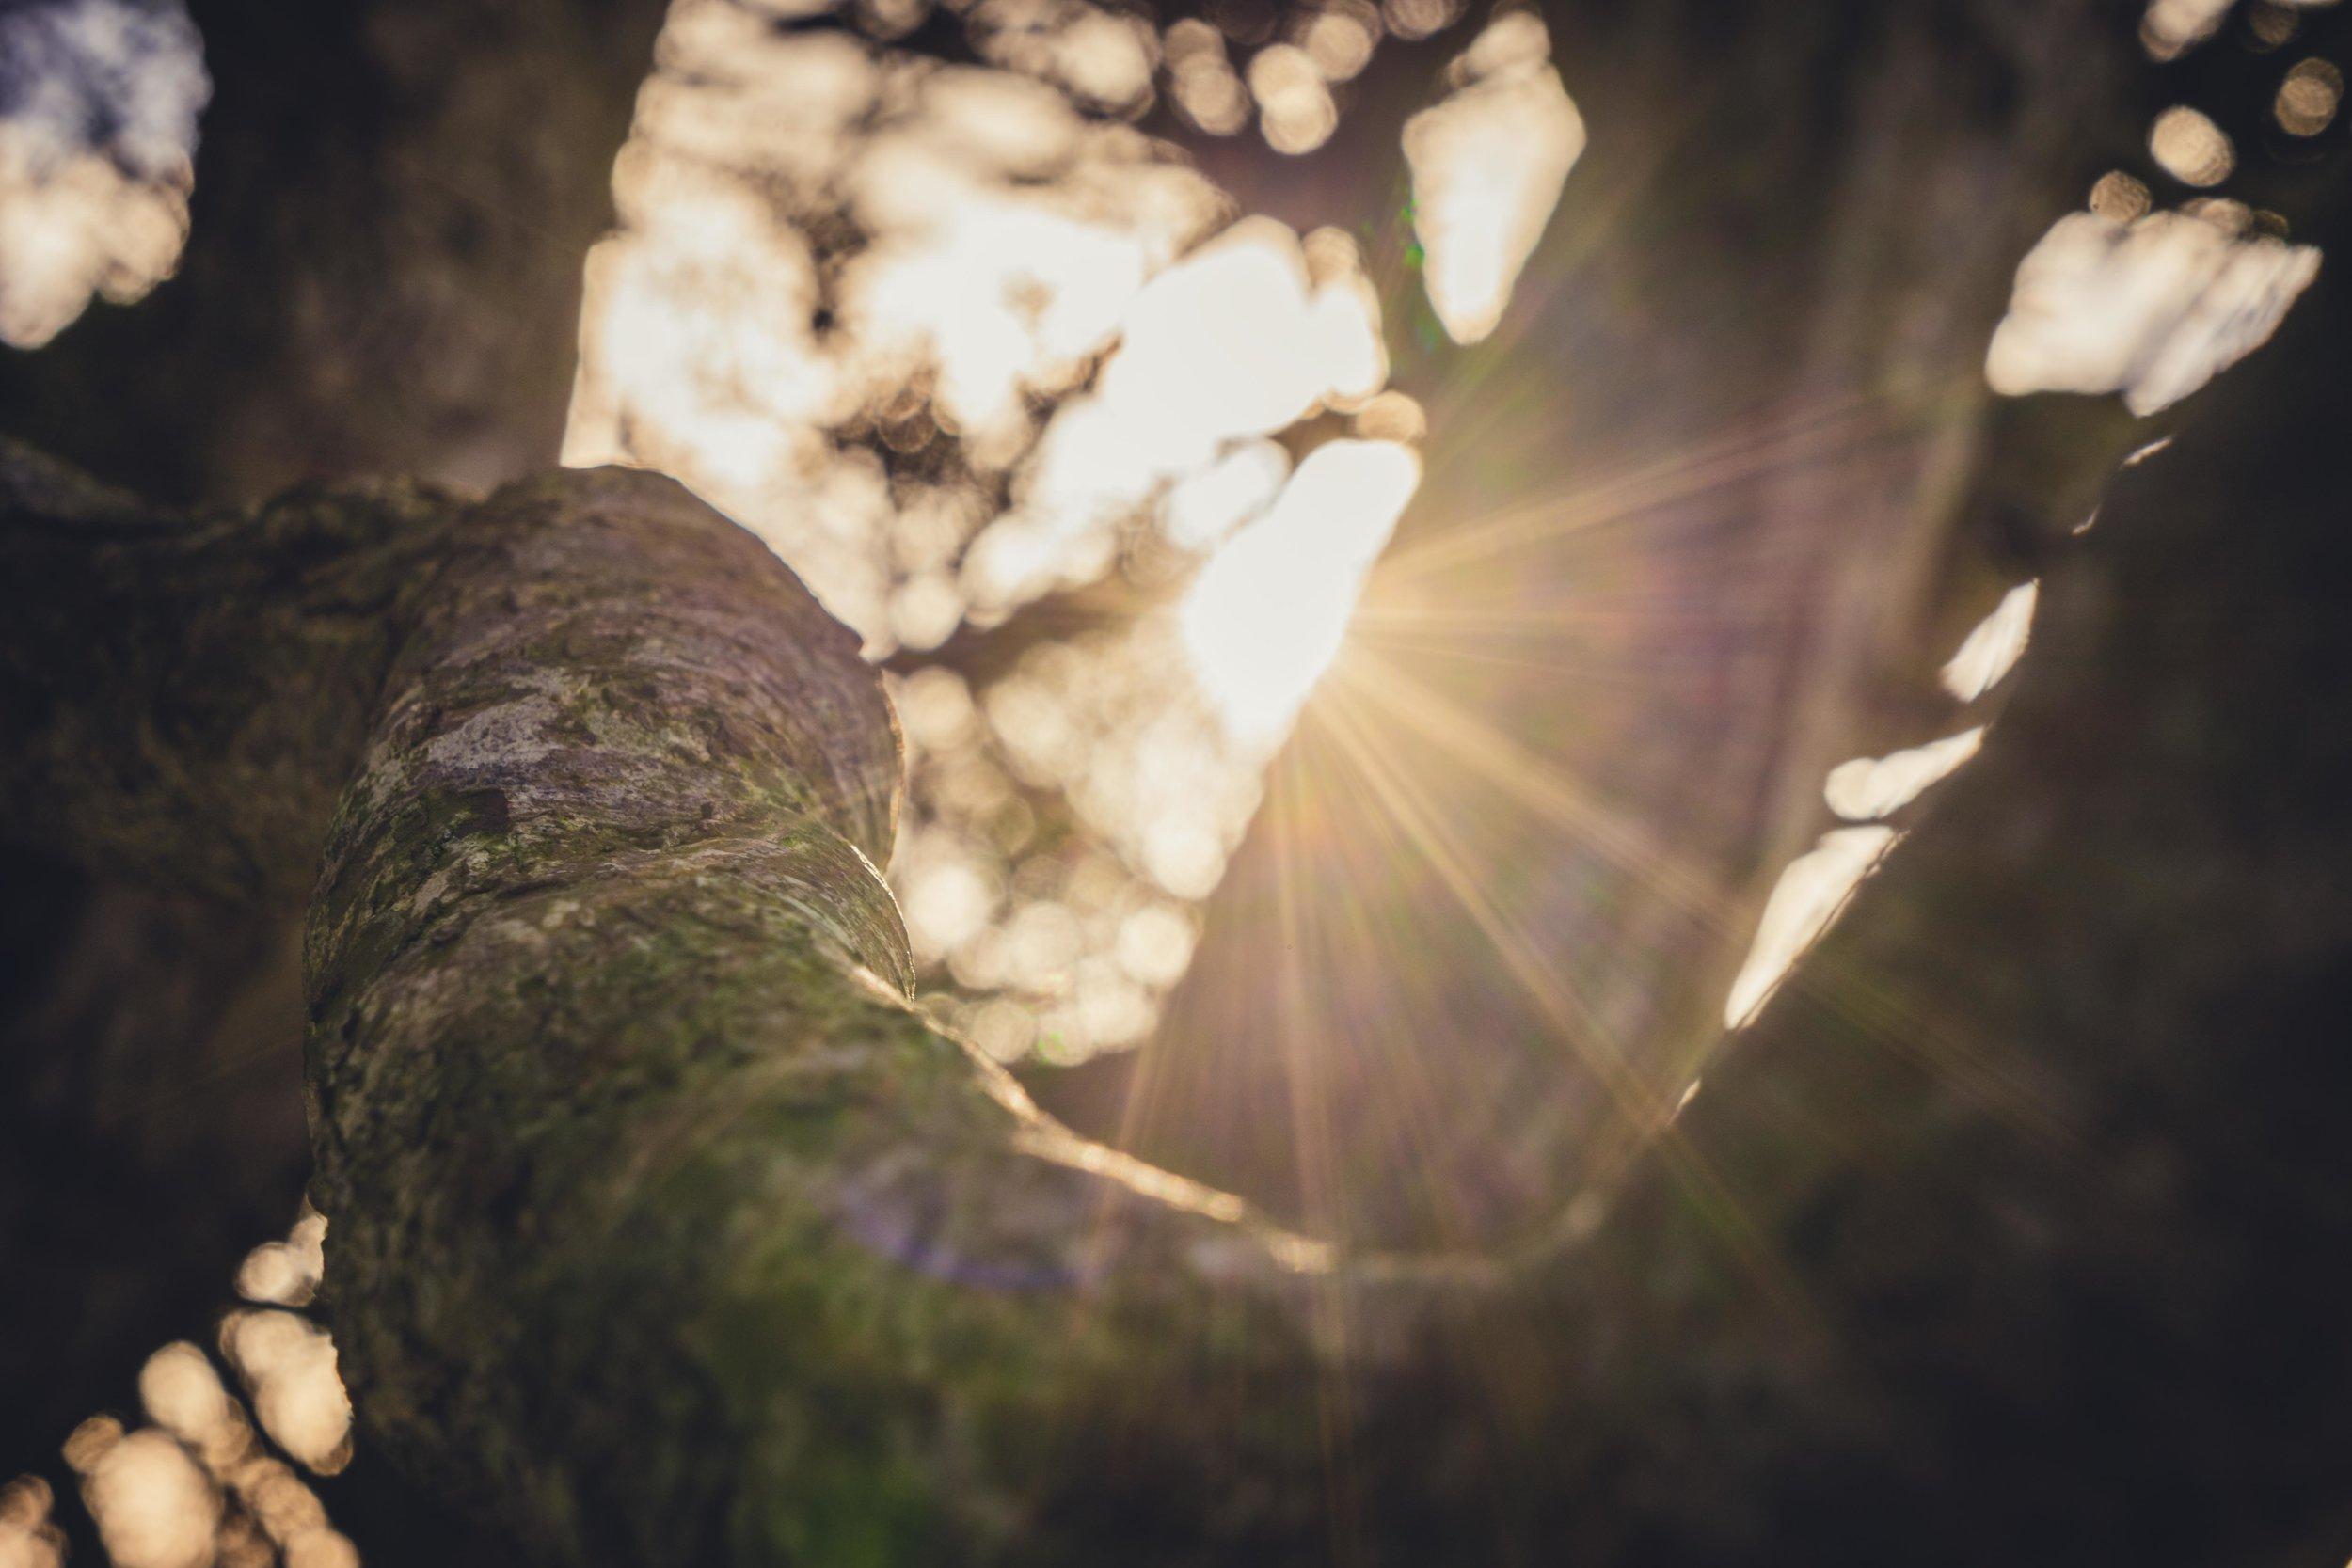 Hill of tara. ireland. history. irish. golden light. travel. blog. autumn. colour. celtic. gaelic. sunlight through the branches.jpg